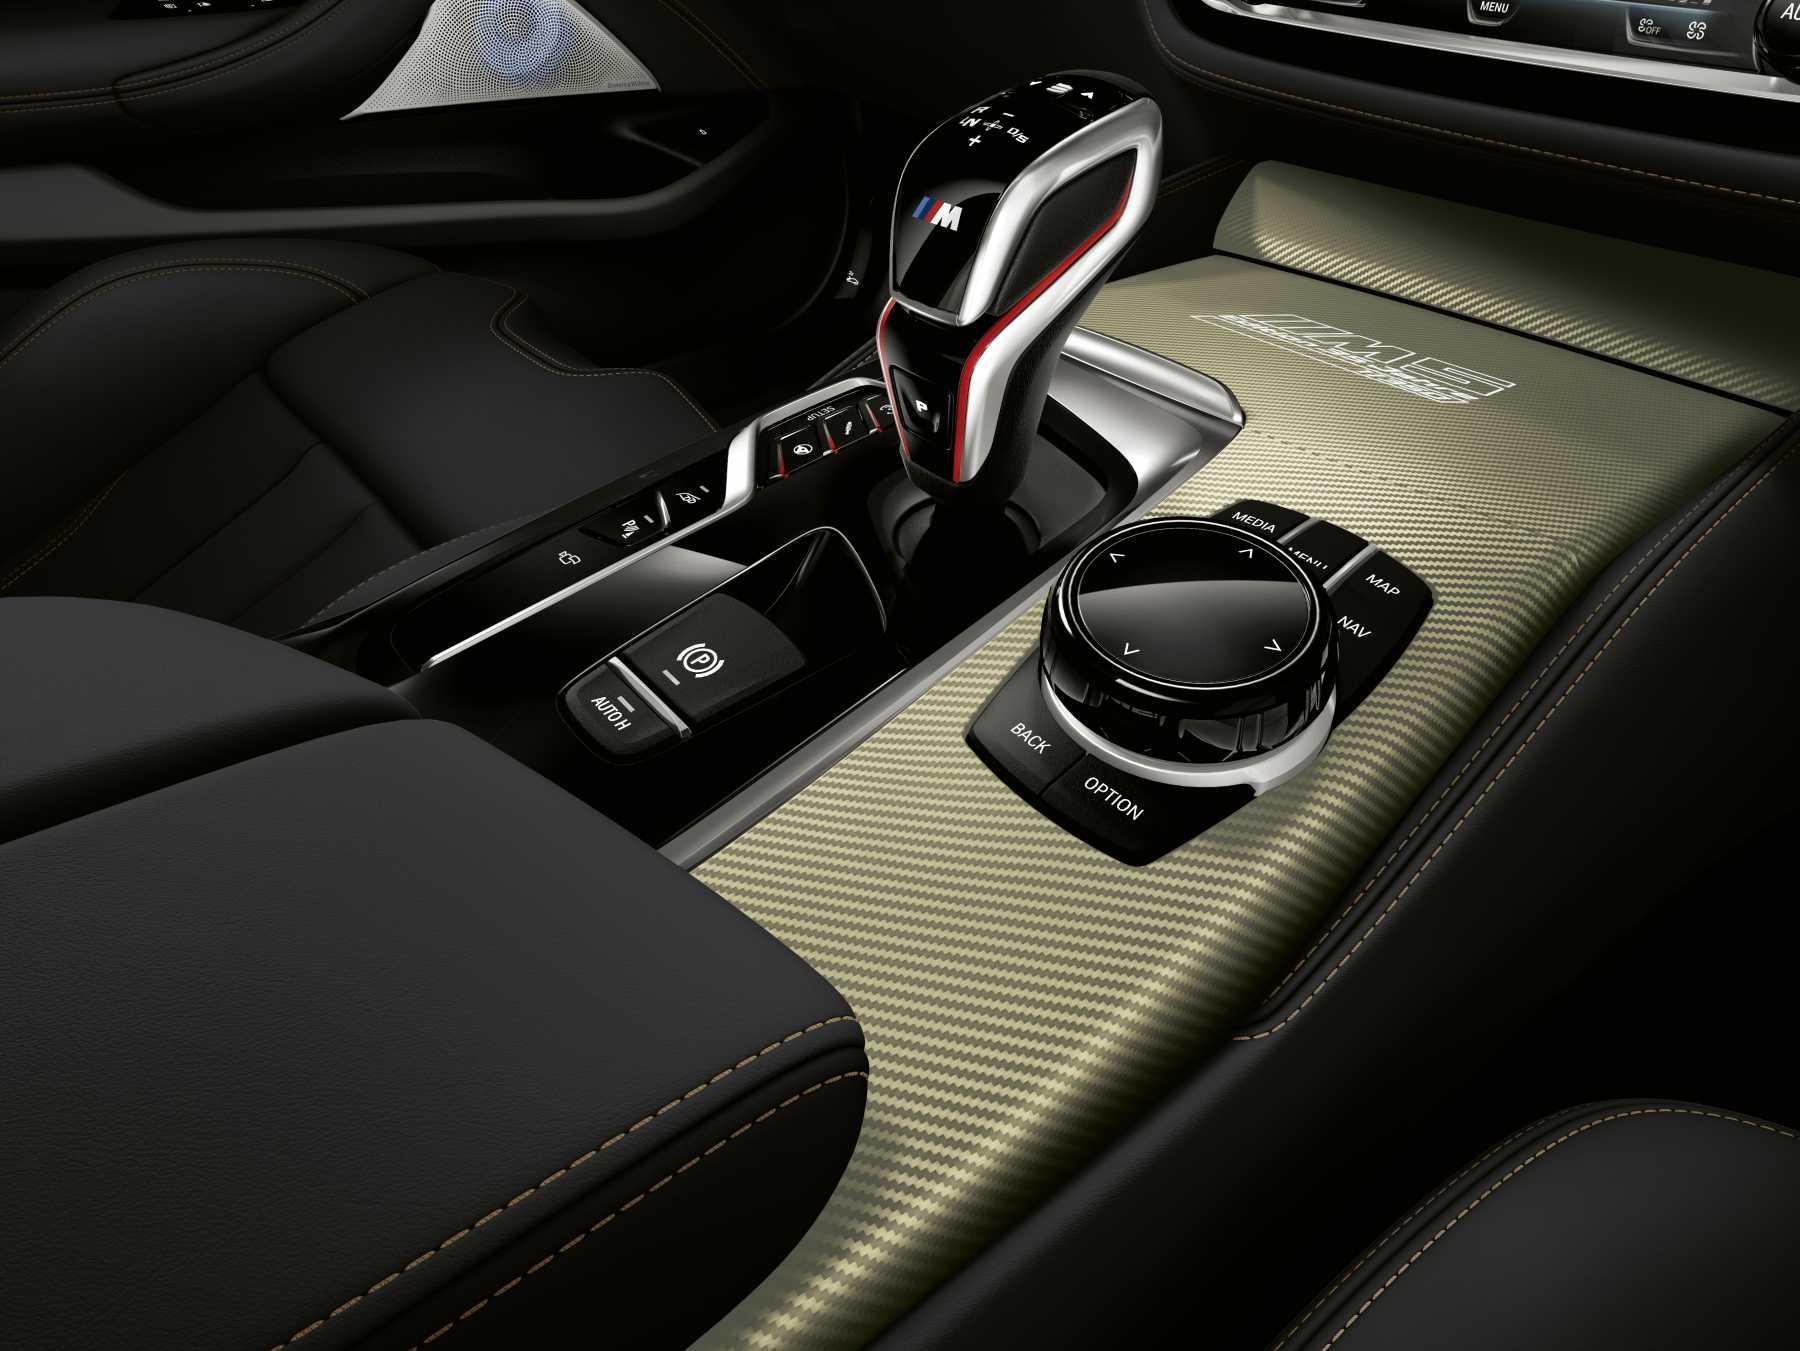 The BMW M5 Edition 35 Jahre Centre Console